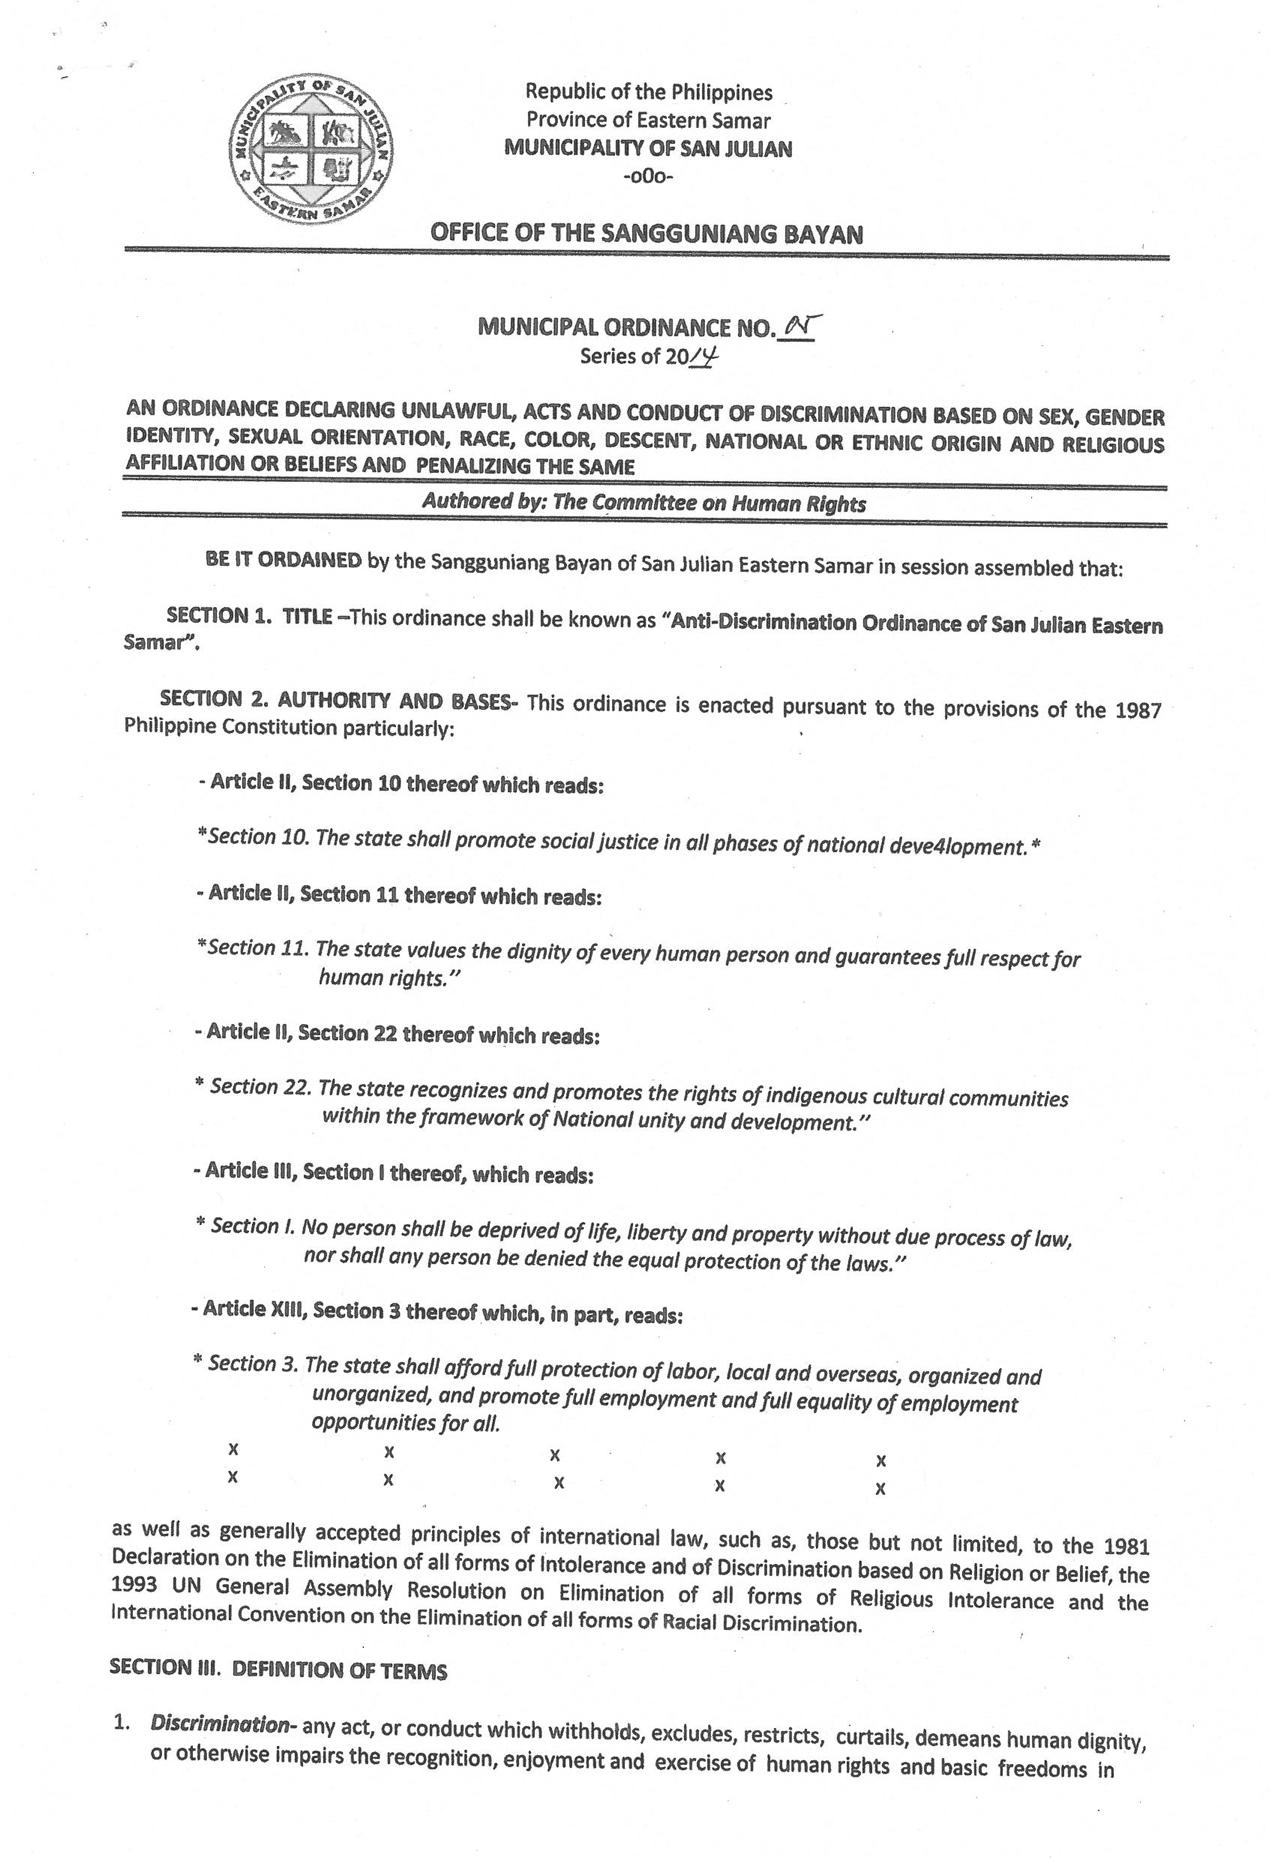 Anti-discrimination ordinance, San Julian, Eastern Samar